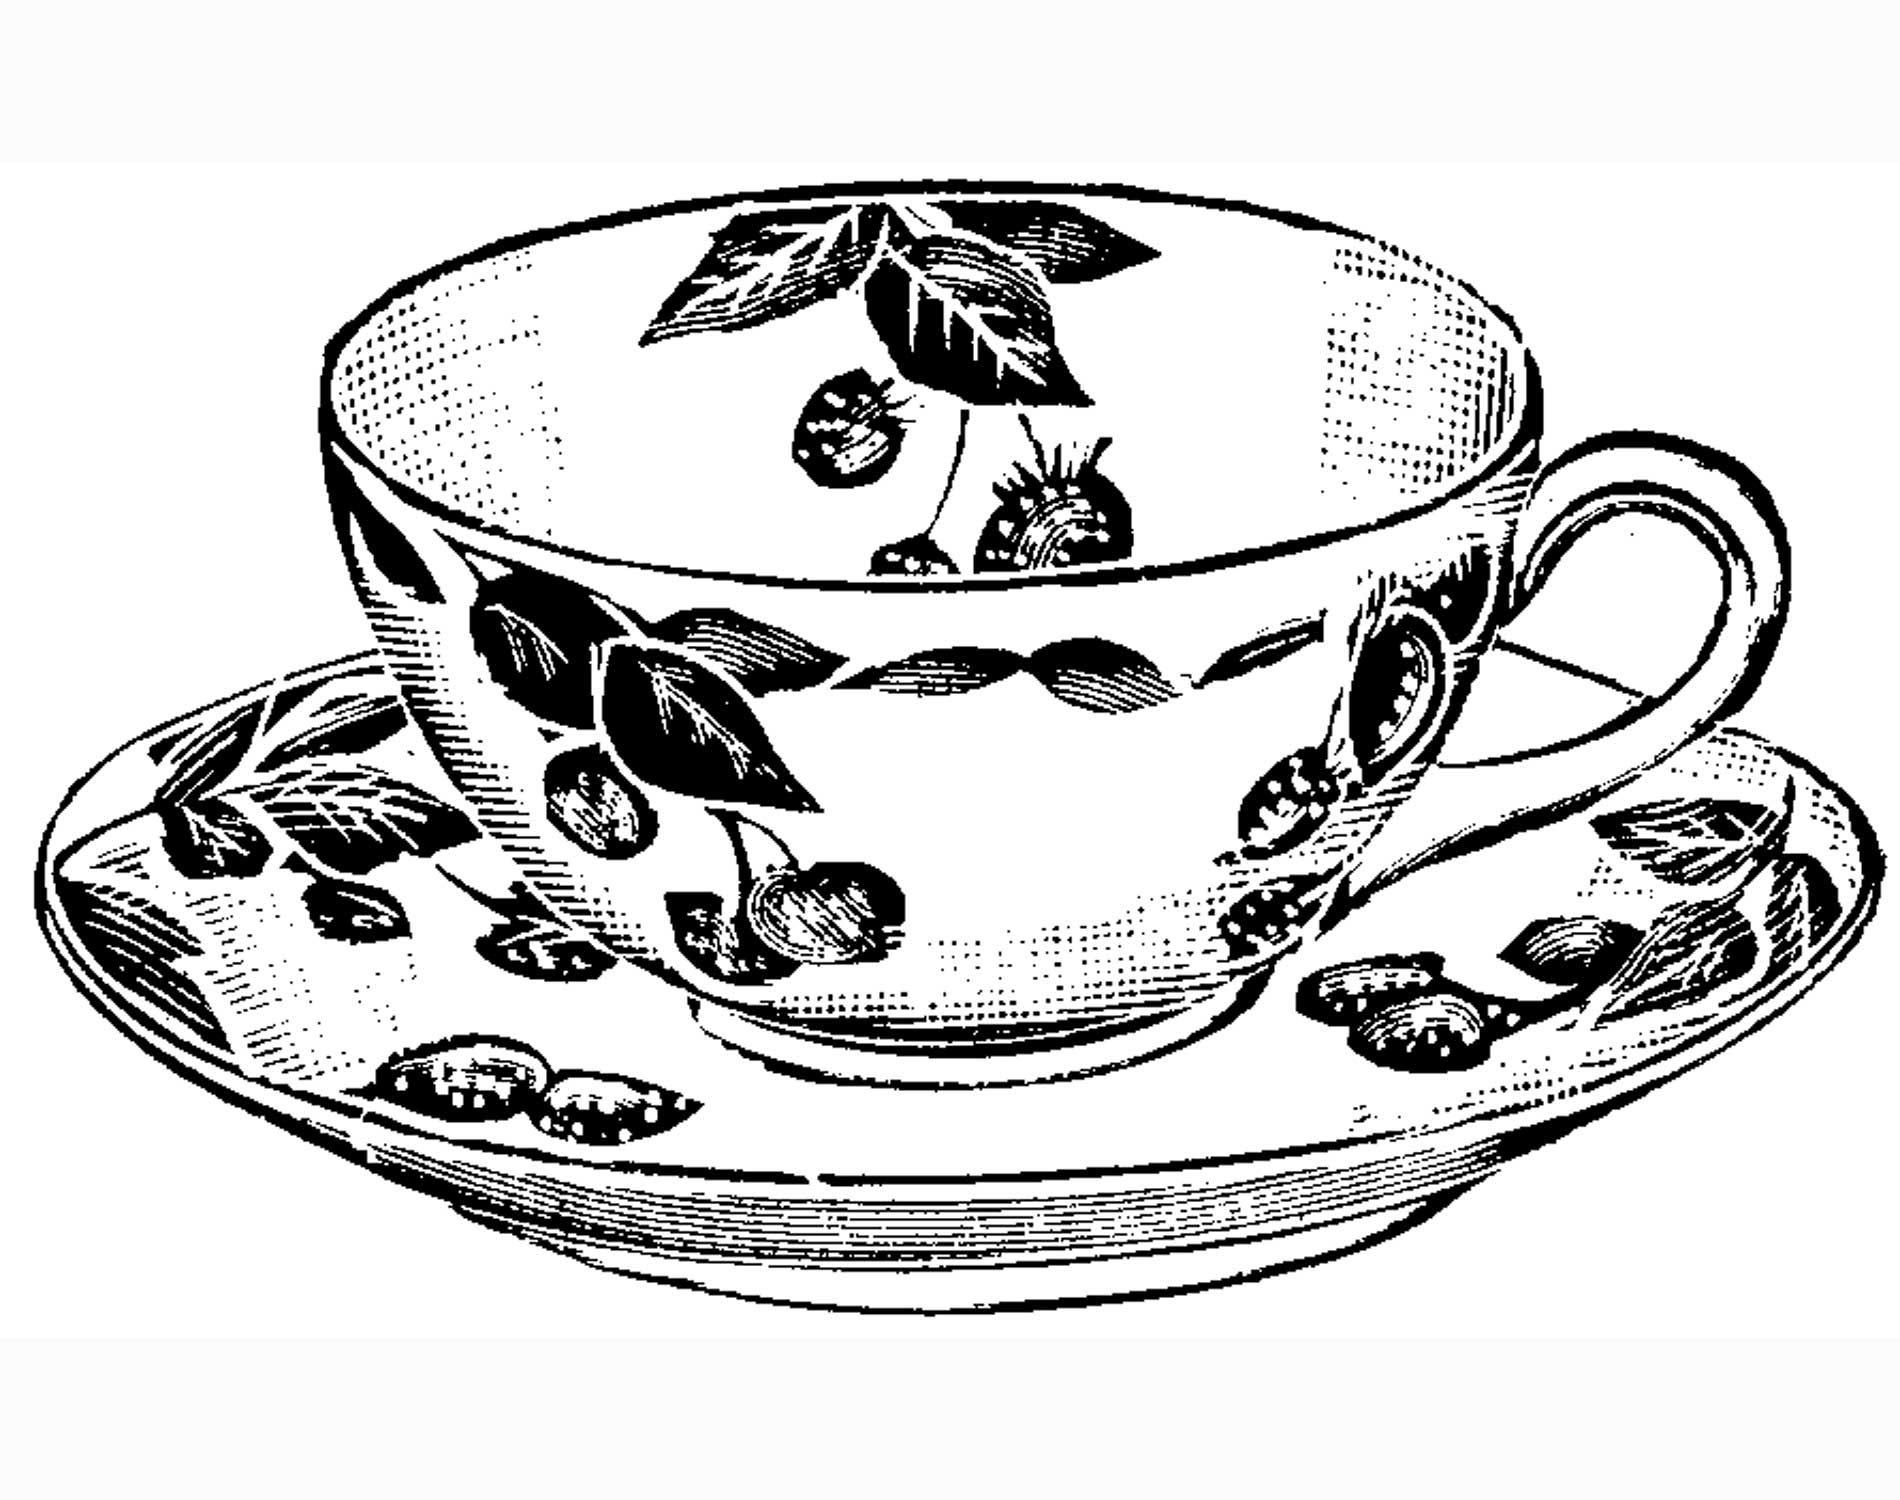 Teacup Print   Craft & Create   Tea Cup Drawing, Tea Cups, Tea - Free Printable Tea Cup Coloring Pages